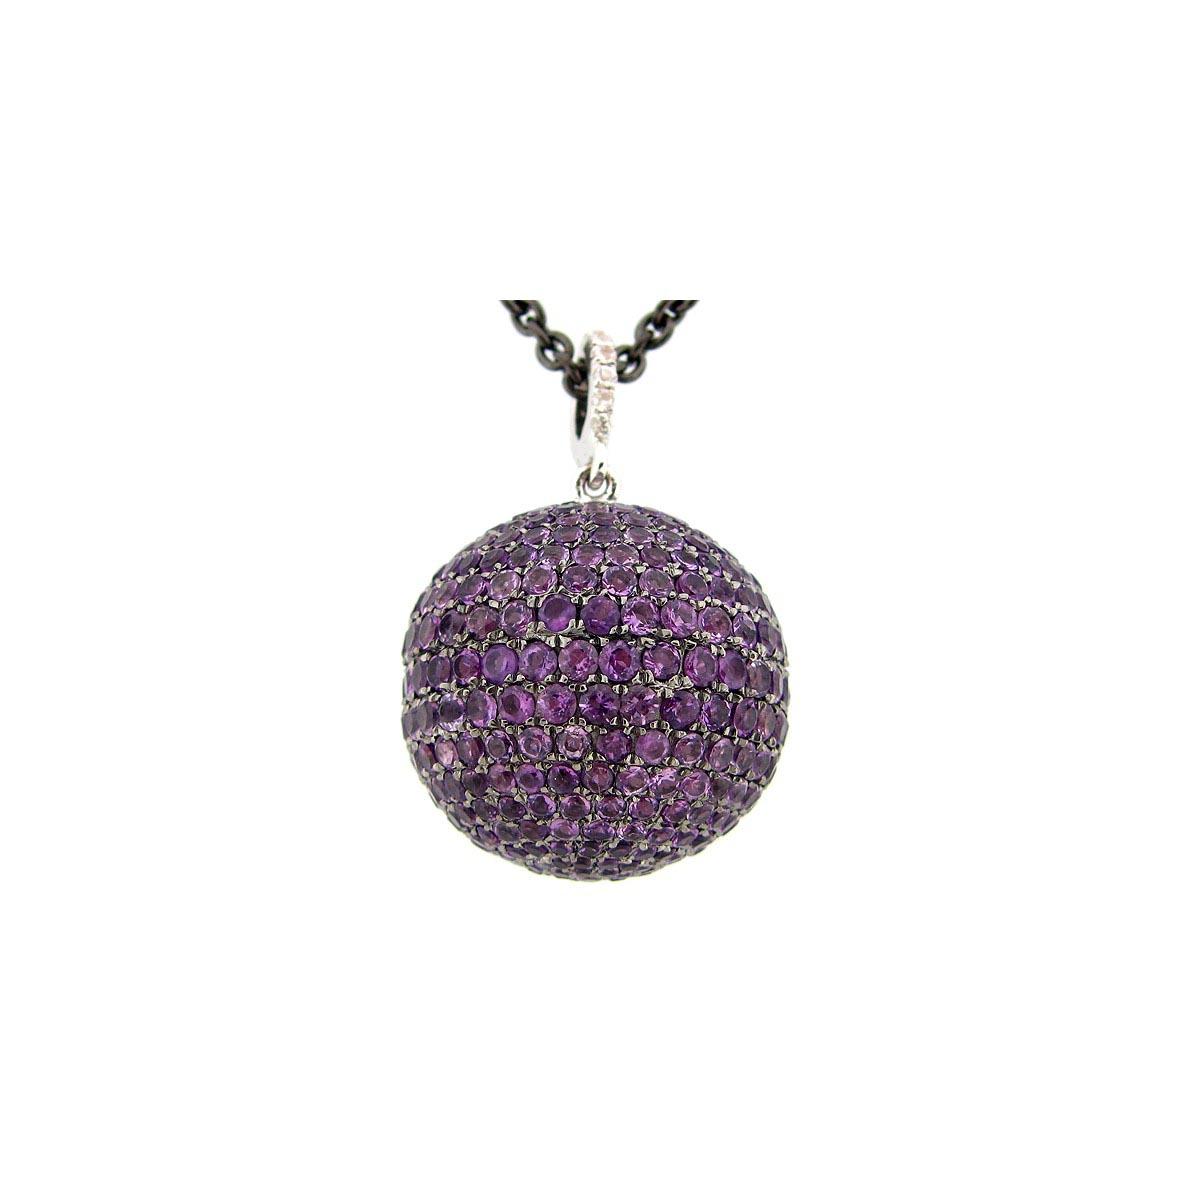 Amethyst Ball Pendant